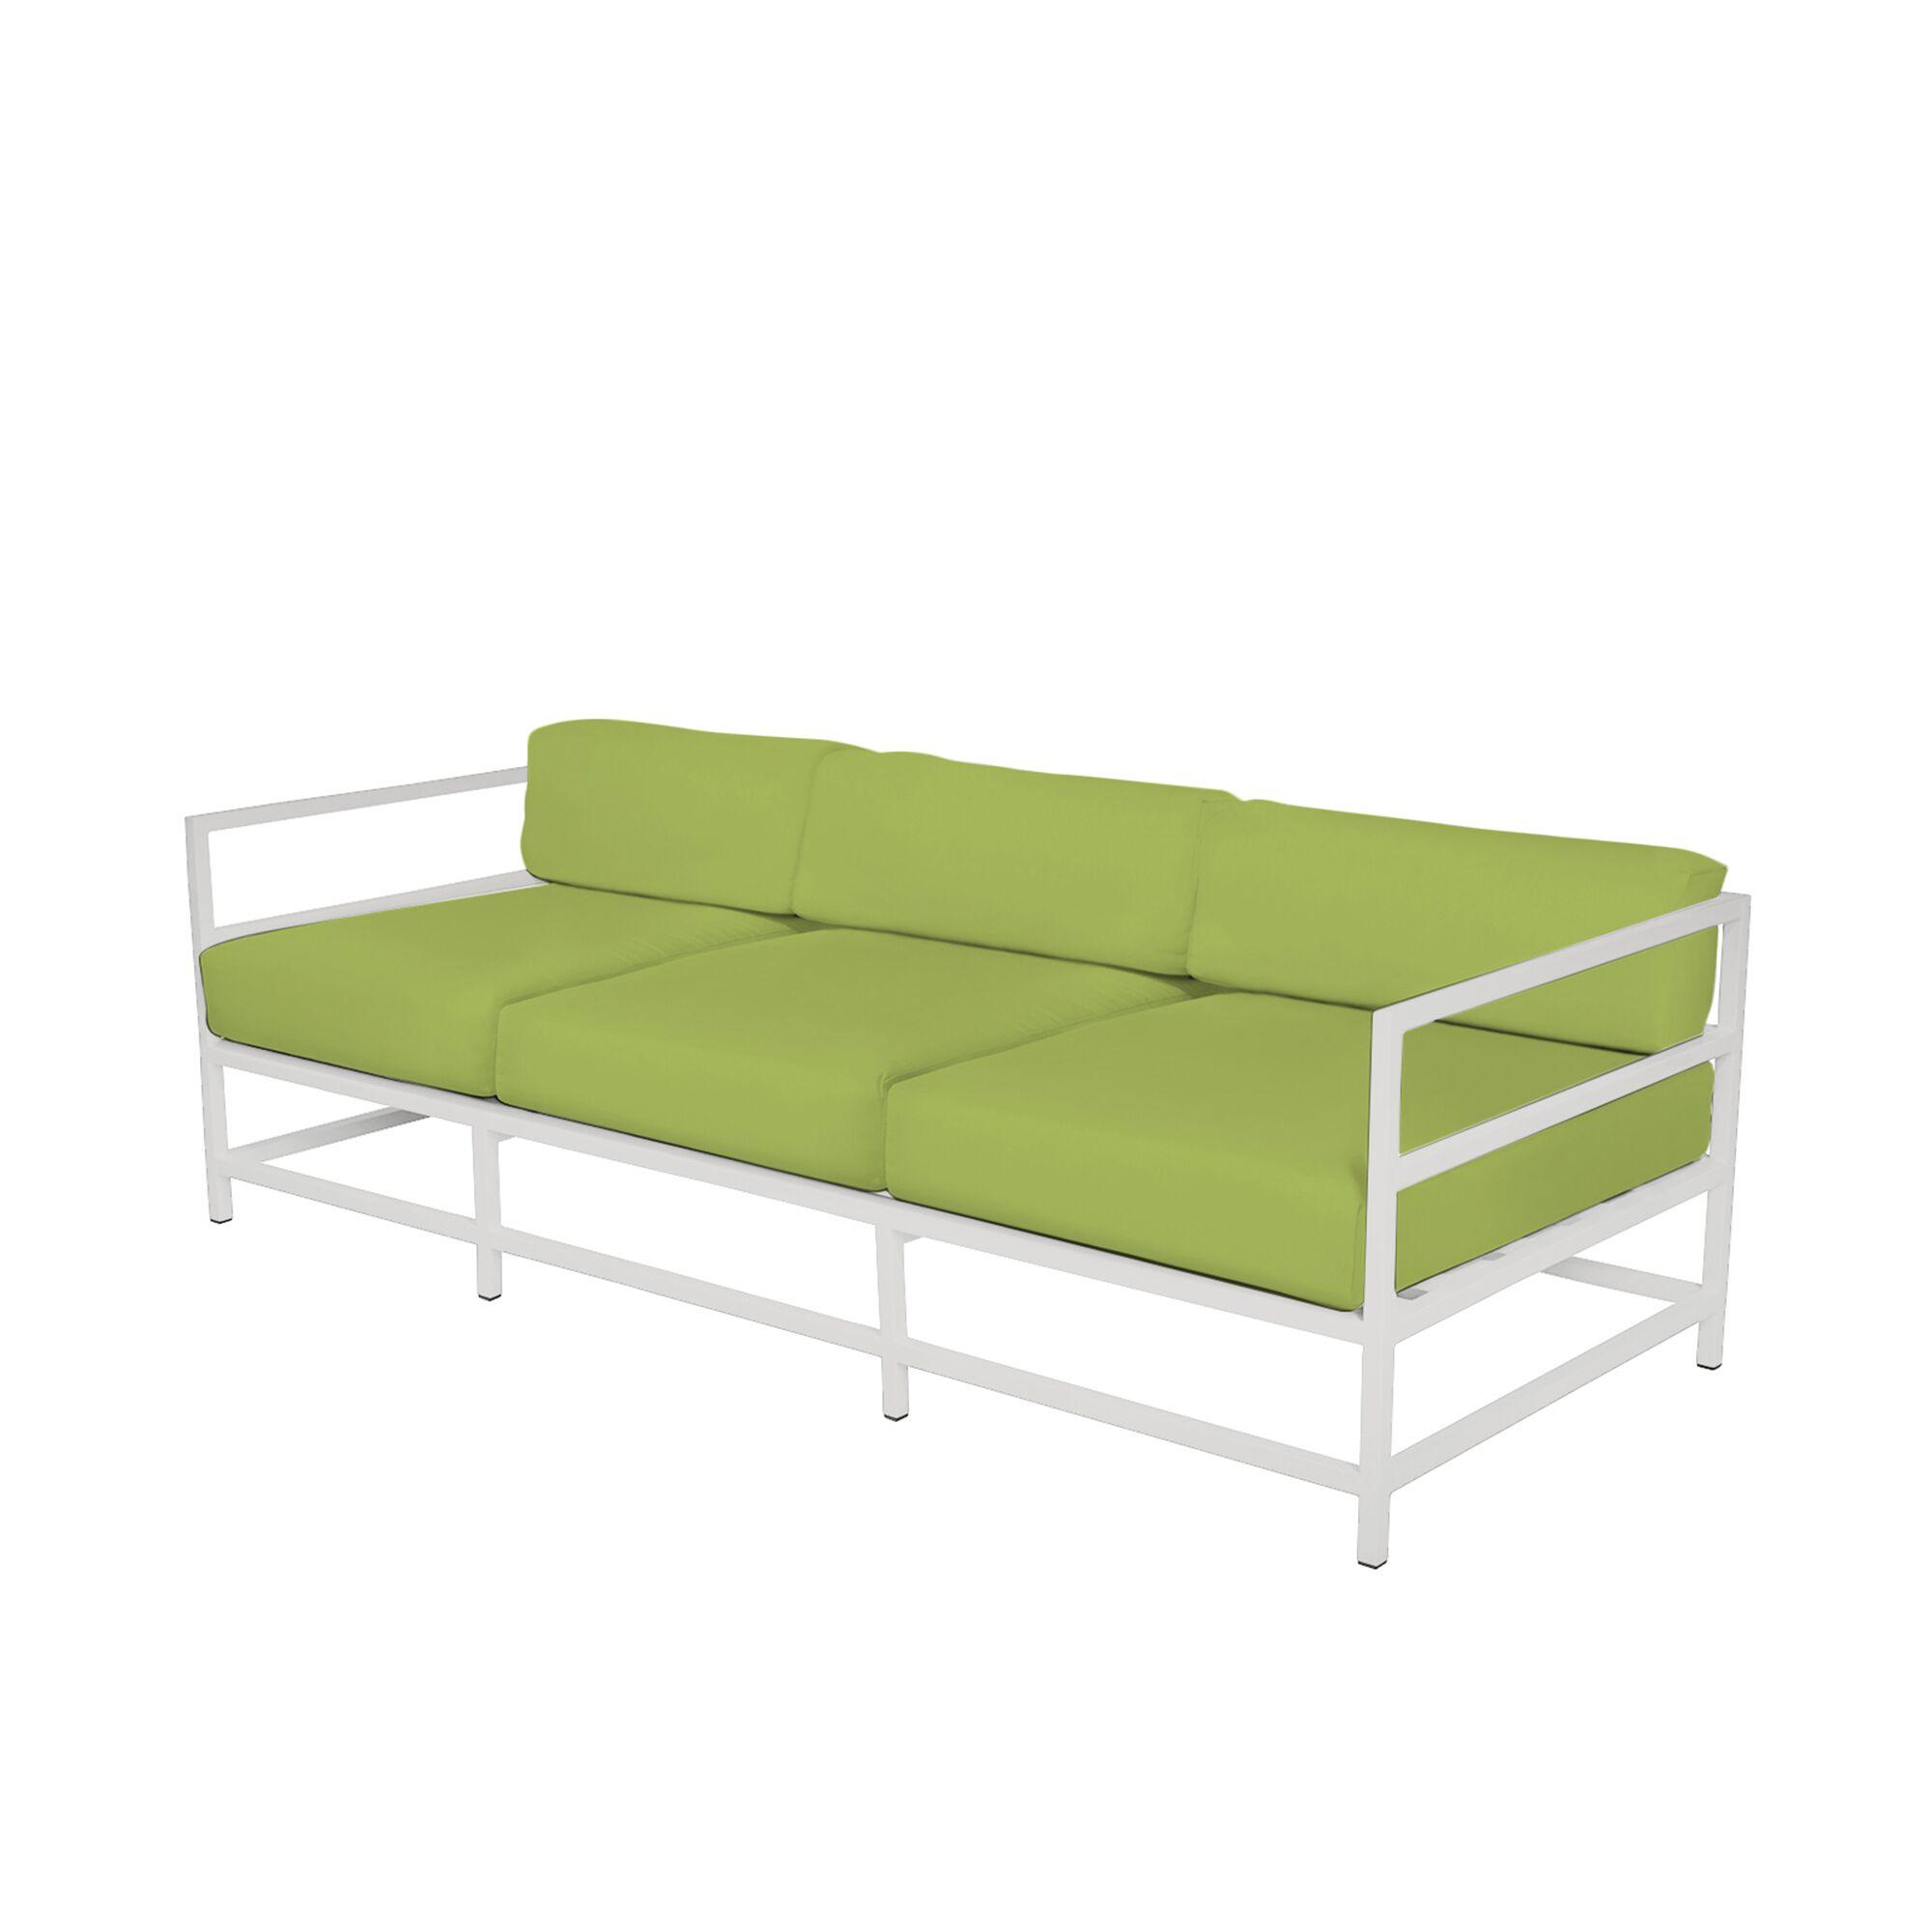 Ashlee Sofa with Cushions Fabric: Sunbrella Parrot